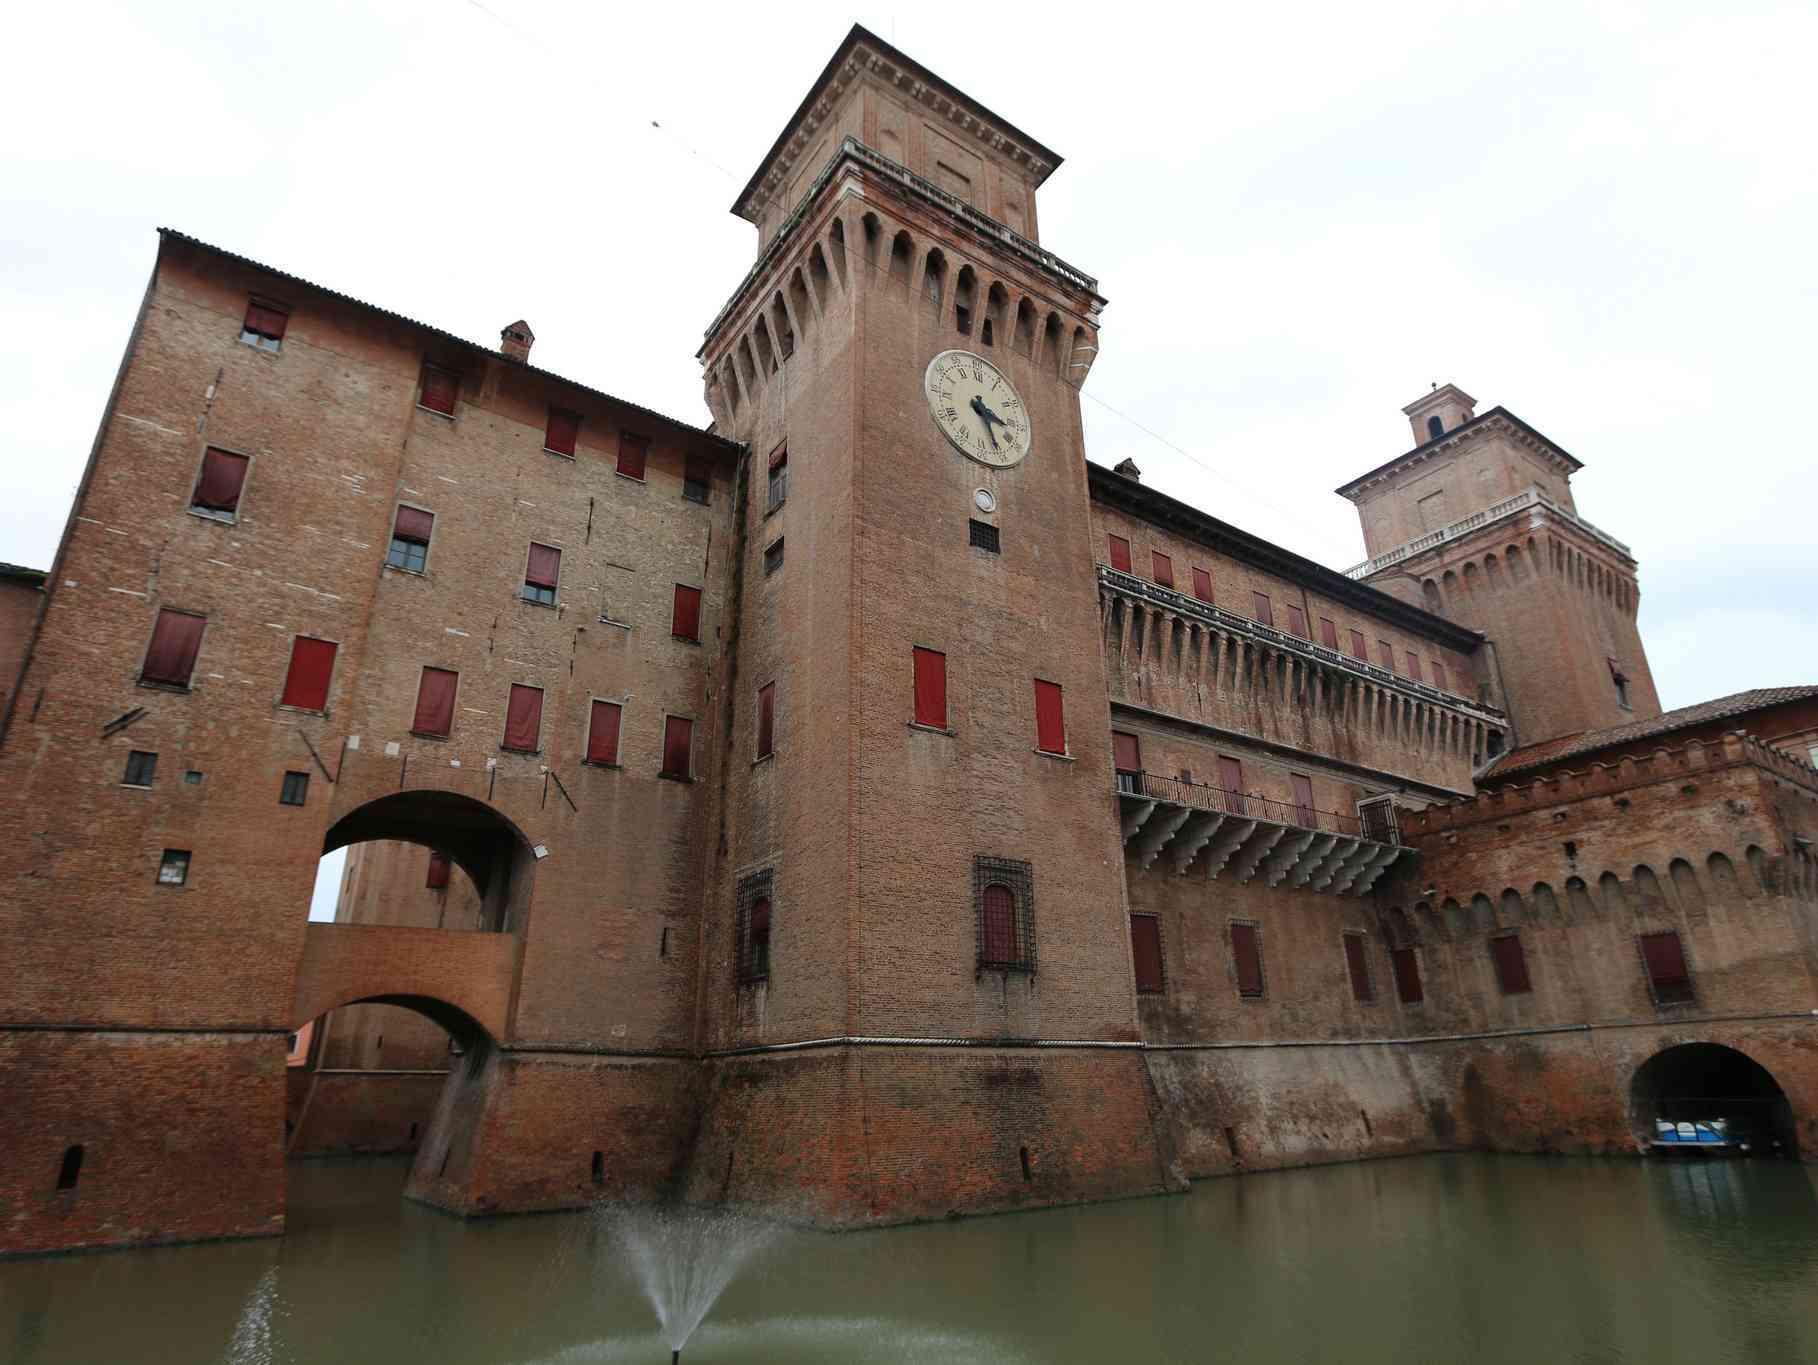 Castello Estense Ferrara - Foto: Juan Antonio Segal /Flickr